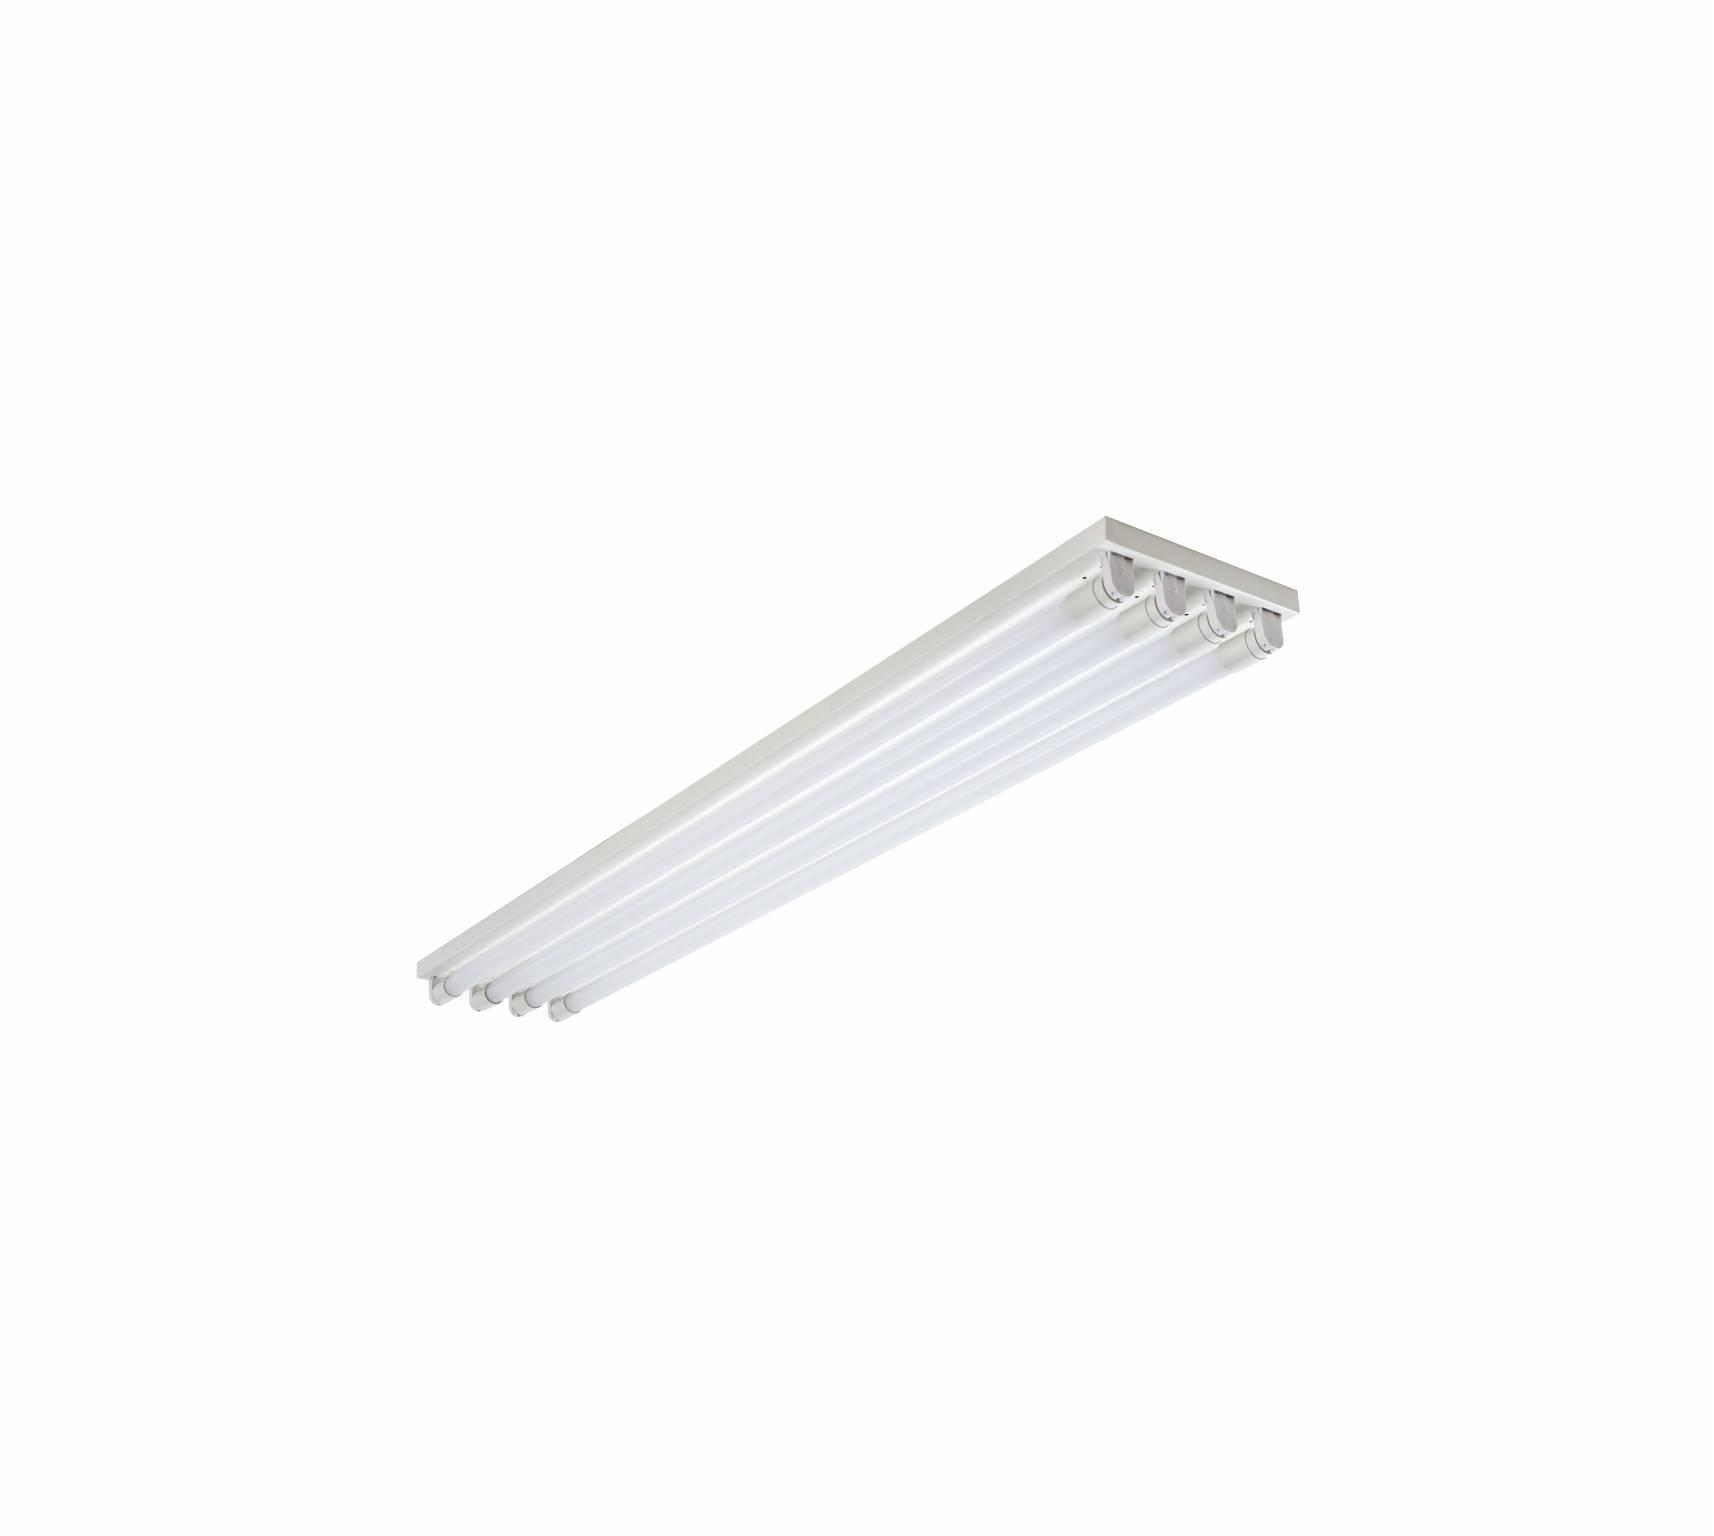 SLIMT8-LED-4X9,9-65-3C <span>(caixa)</span><br/>